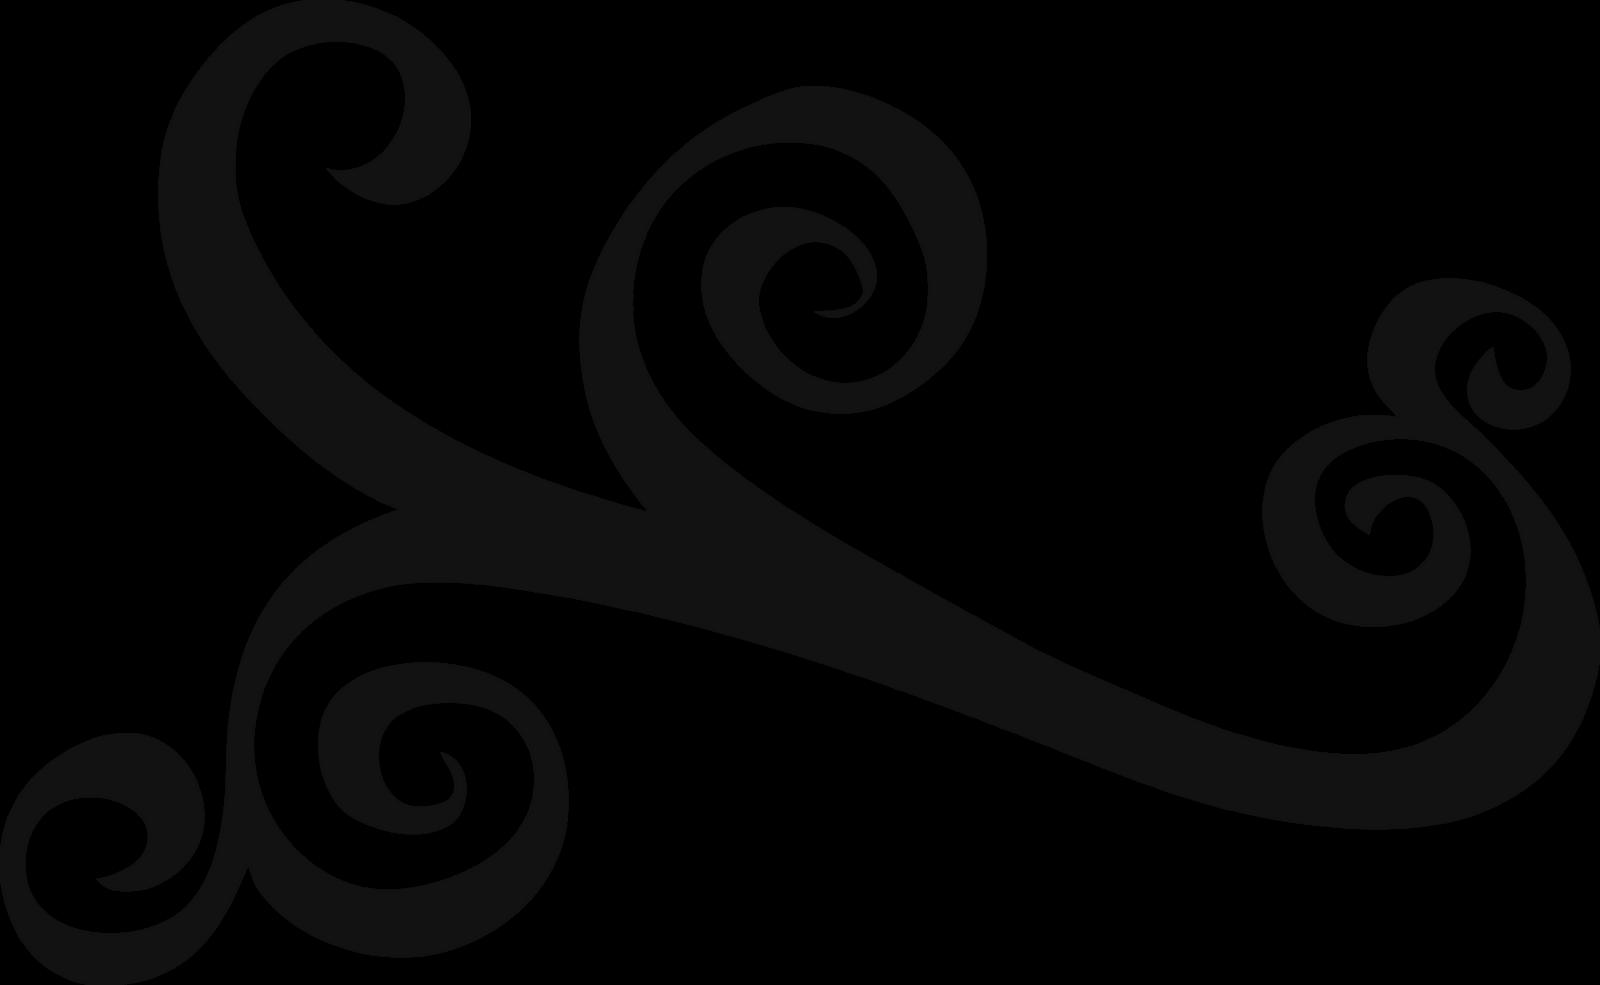 clipart design - Swirls Clip Art